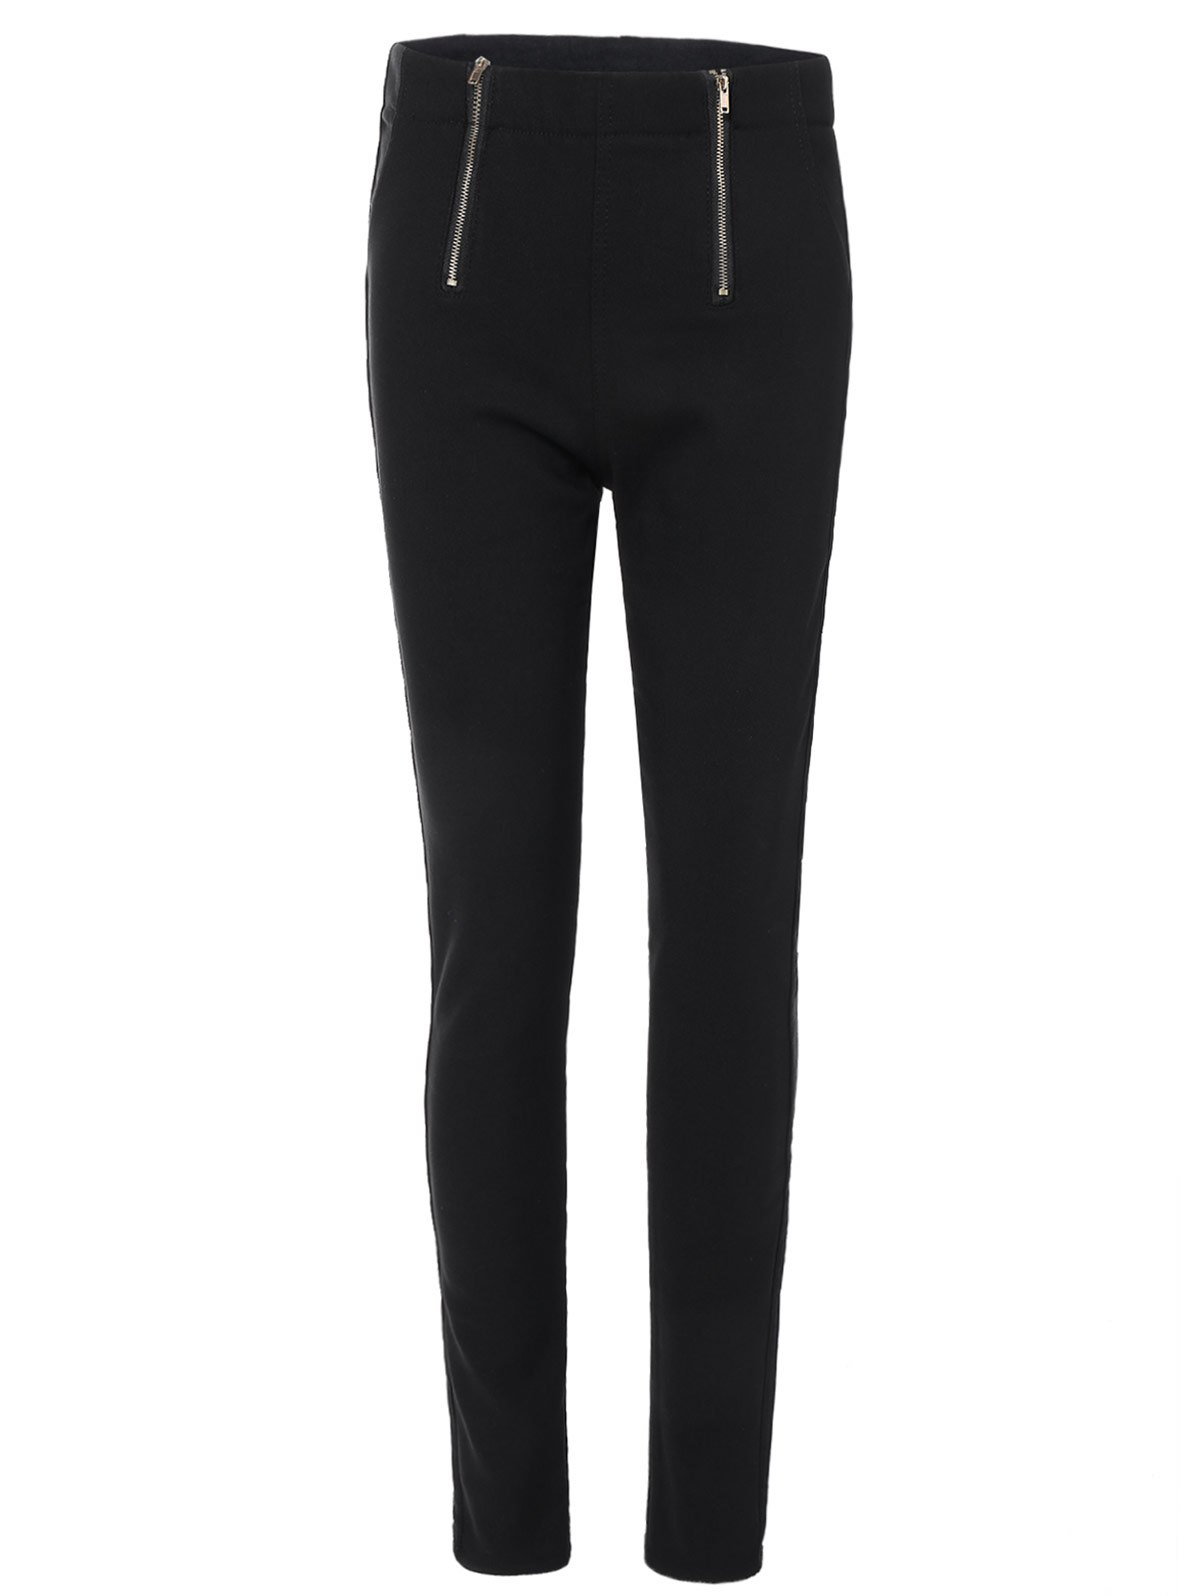 Casual Zipper Embellished Pencil Pants